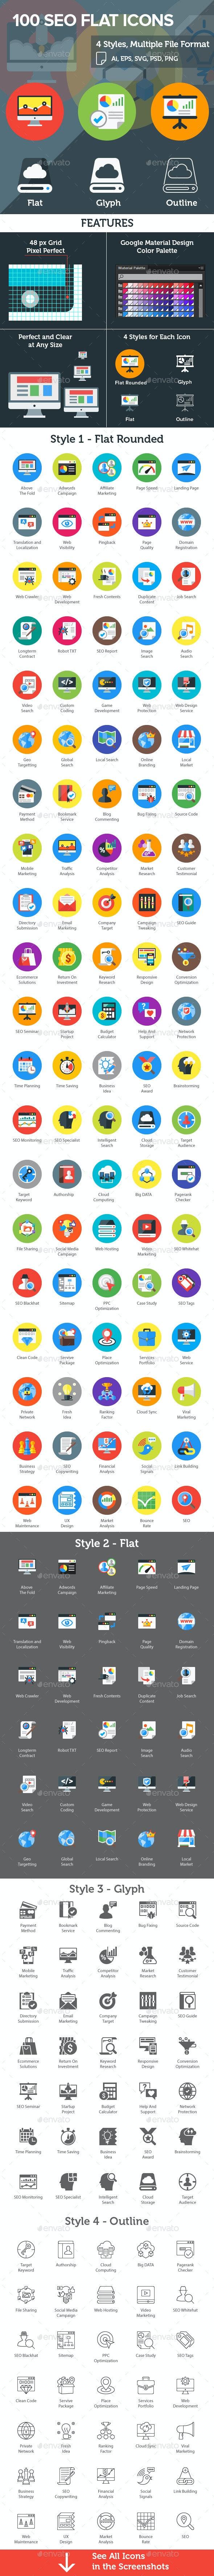 SEO Flat Icons - Icons